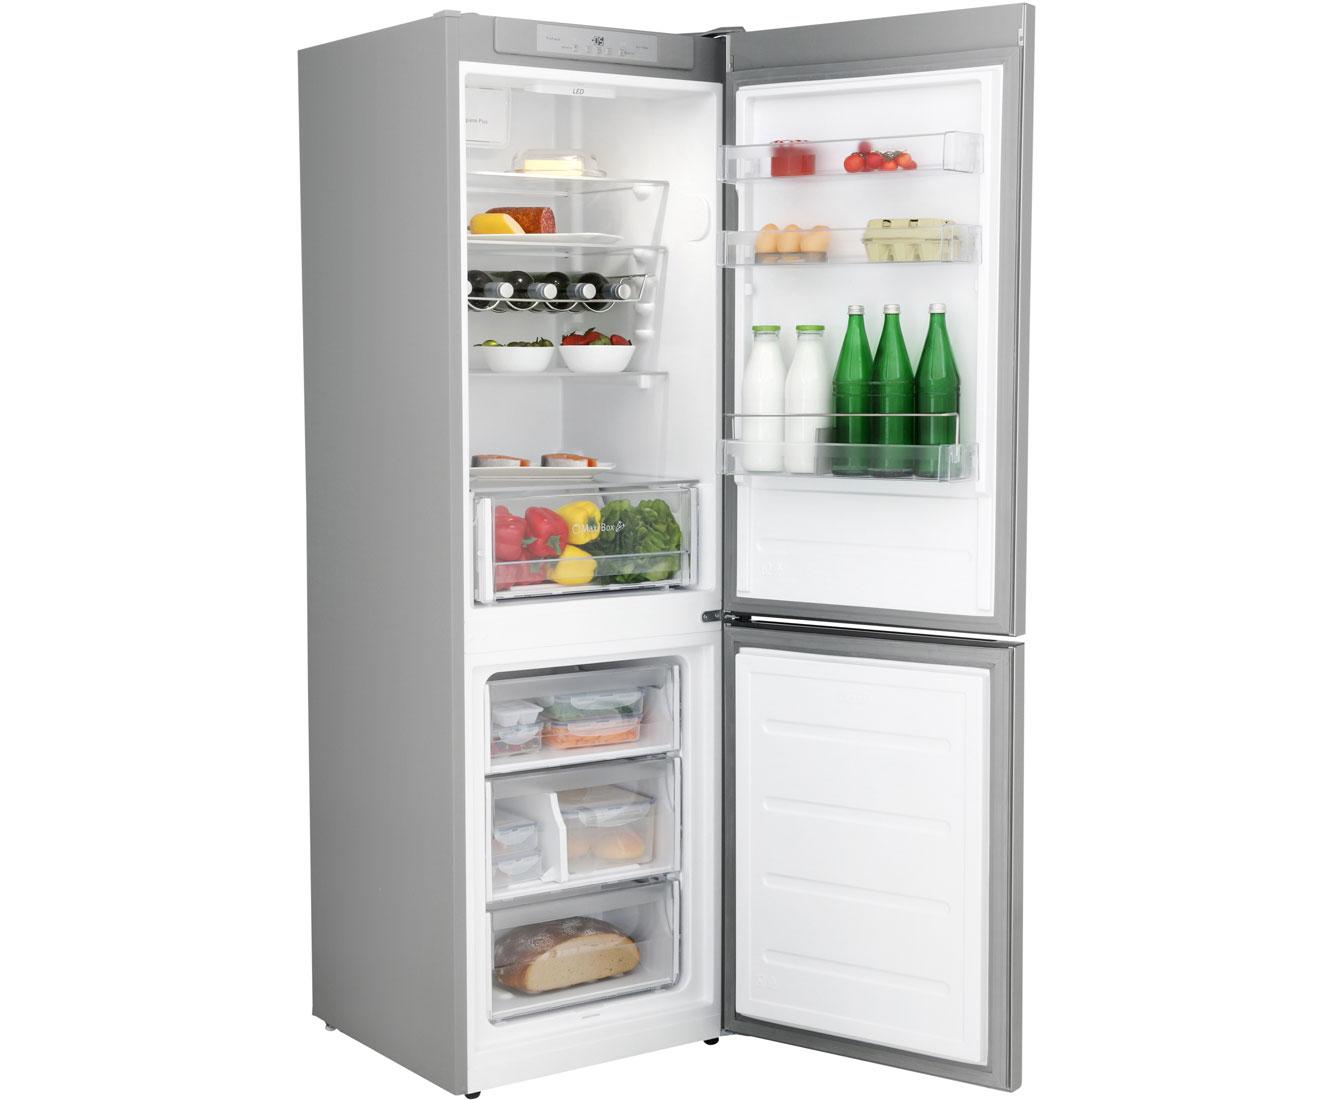 Kühlschrank No Frost Bauknecht : Bauknecht kgnfi a in no frost kühl gefrierkombination